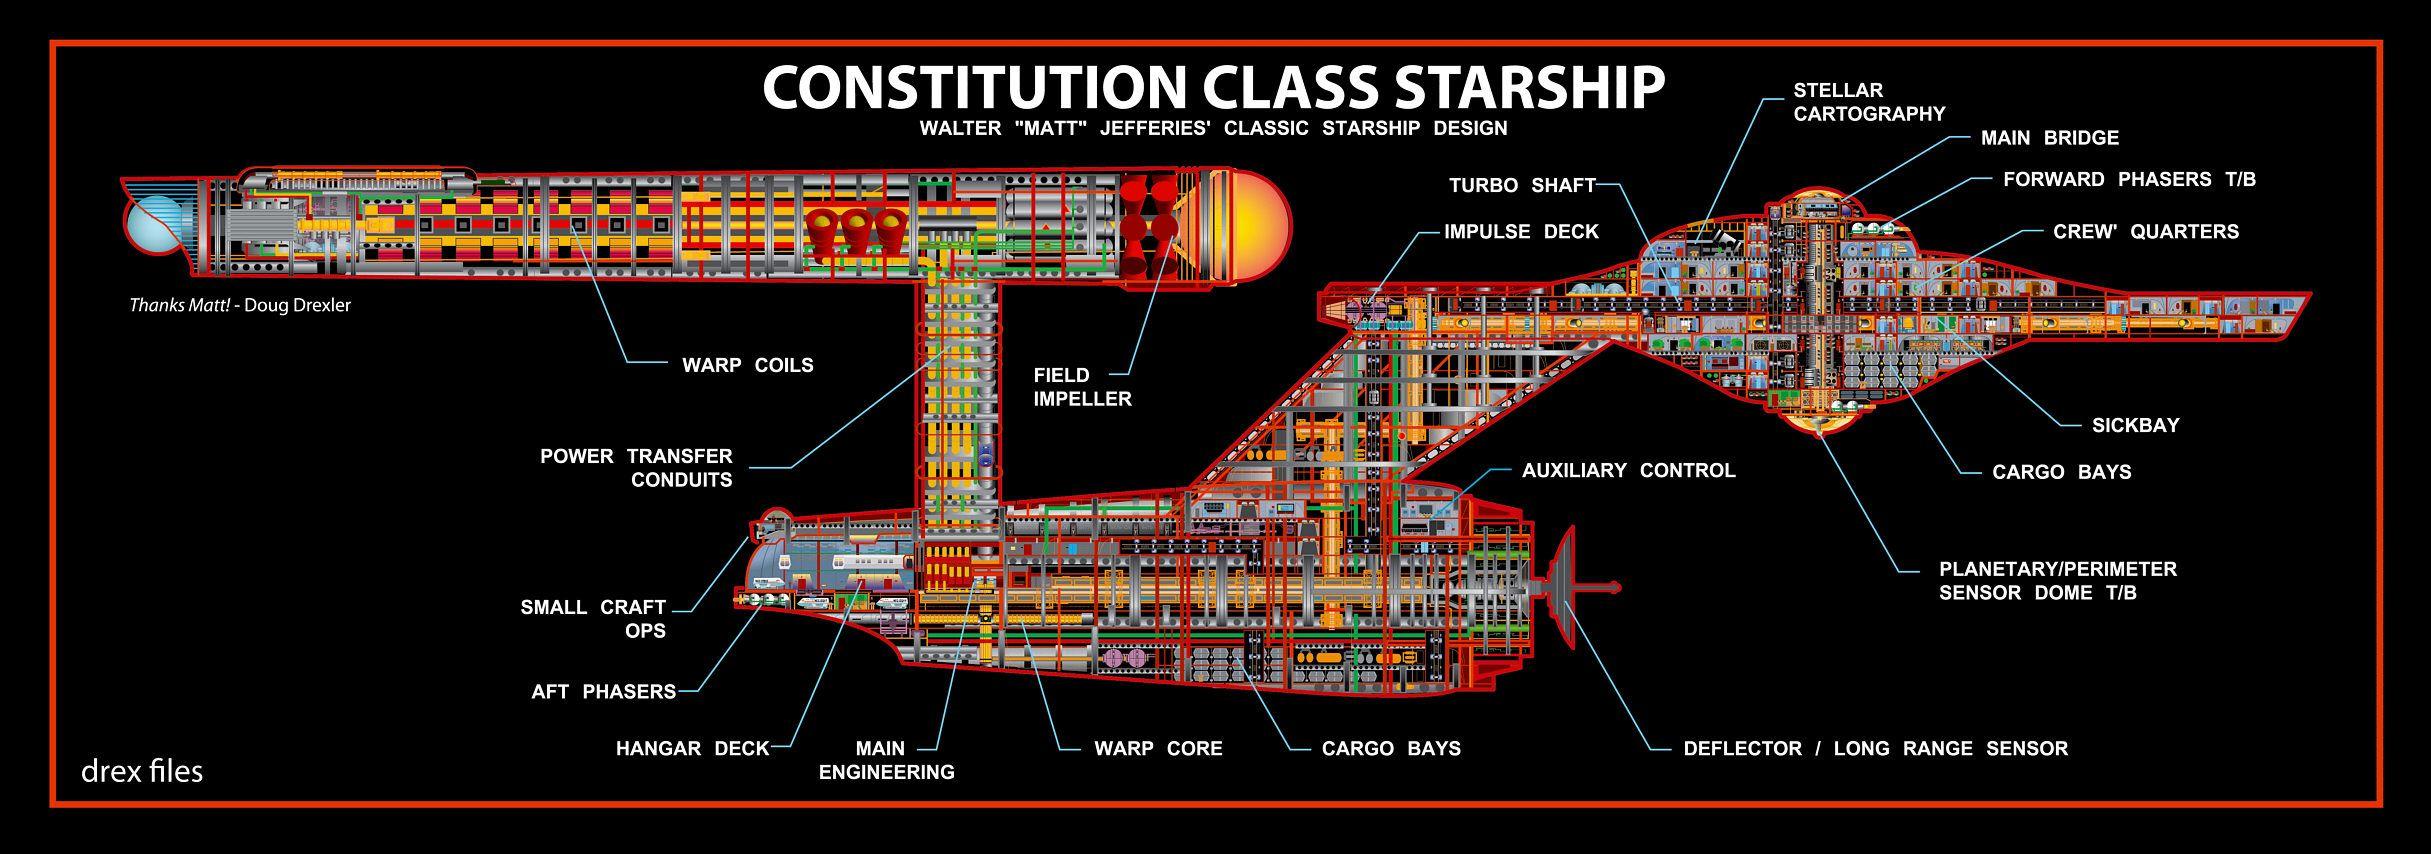 Star Trek Constitution class Cutaway by Twinky Twinky Stars 2431x854